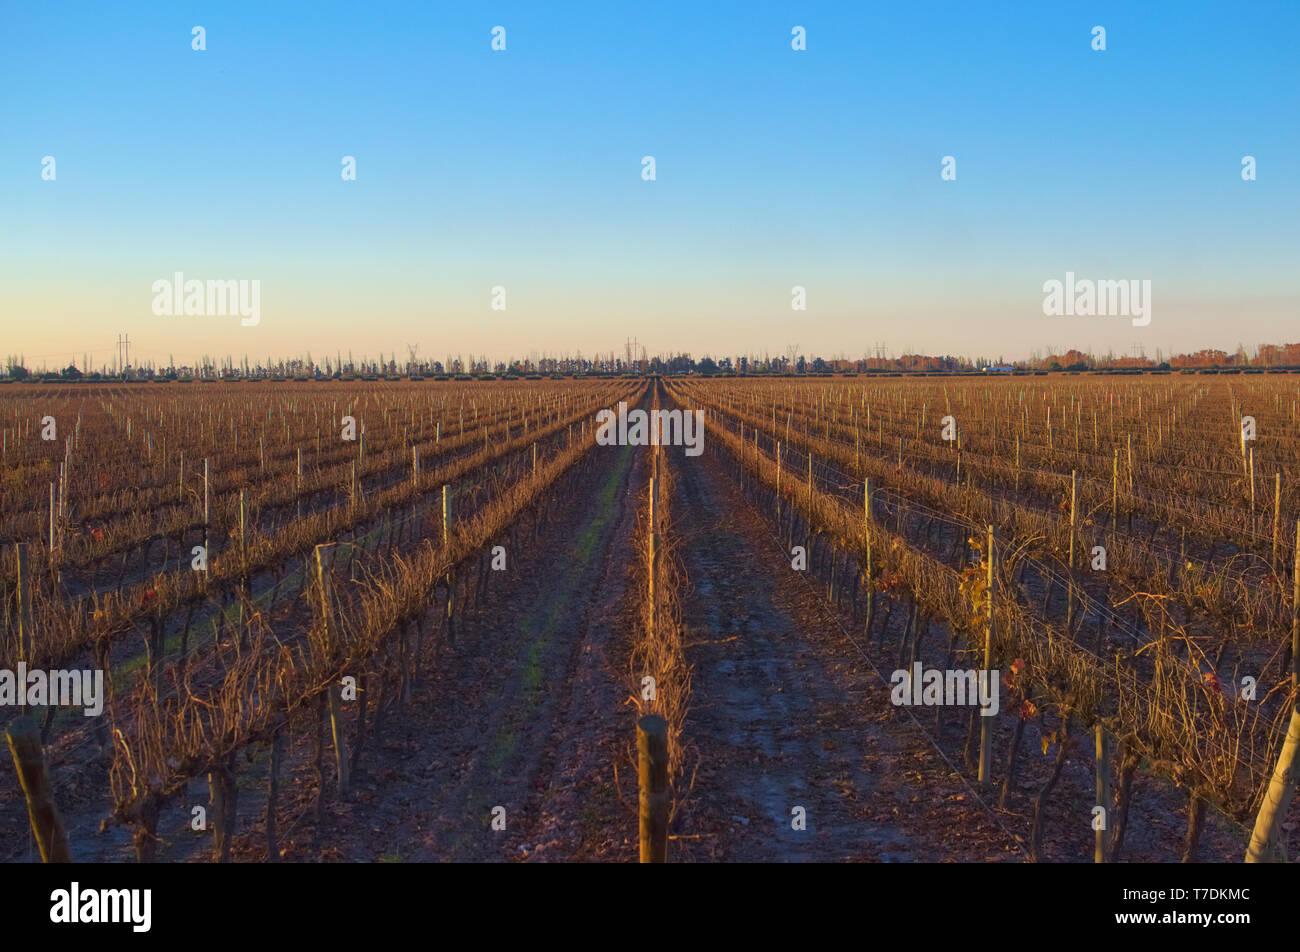 Vineyard rows at sunset in Mendoza, Argentina - Stock Image